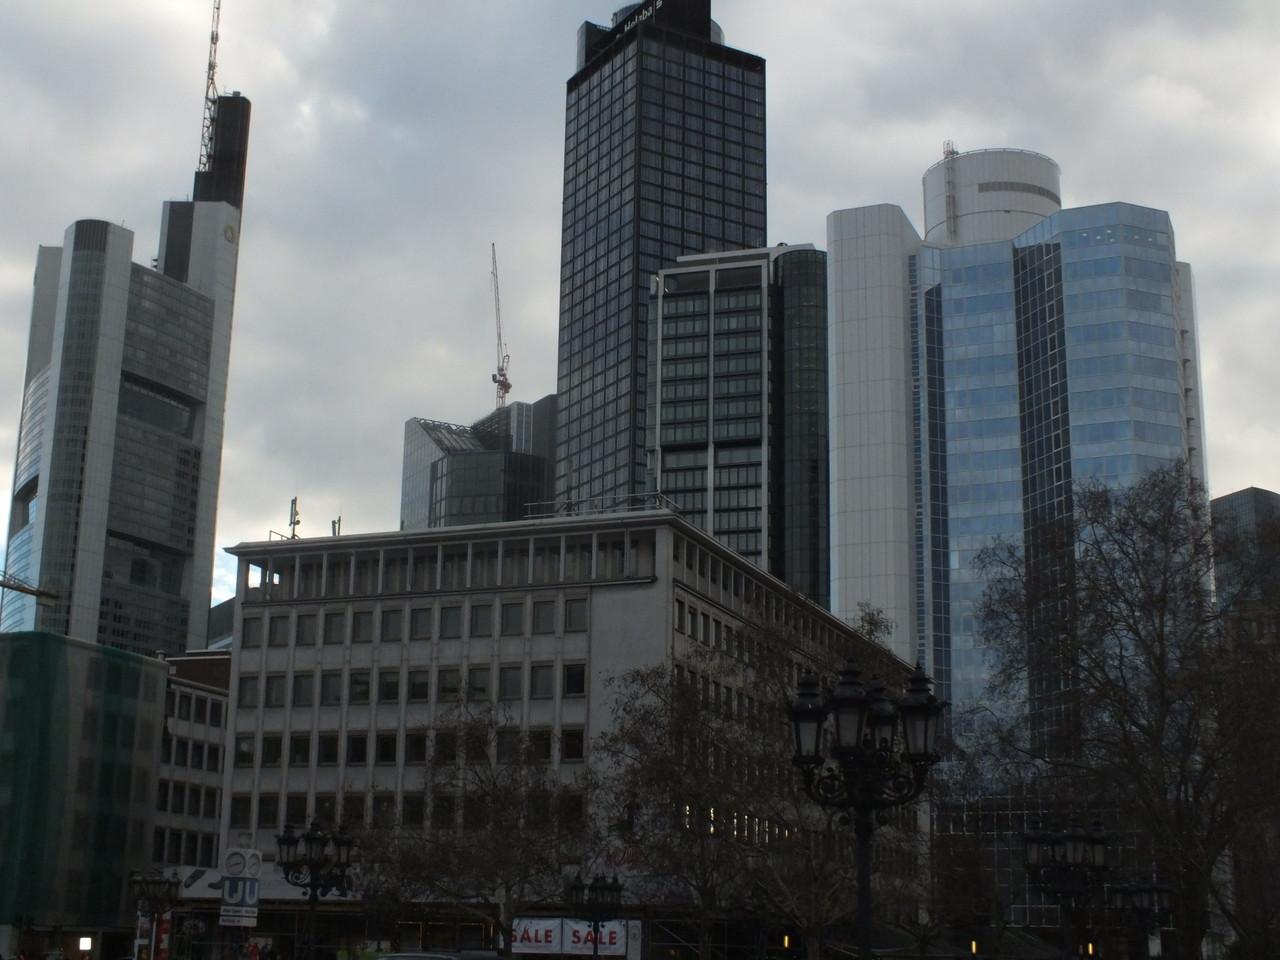 Banktürme vom Opernplatz aus